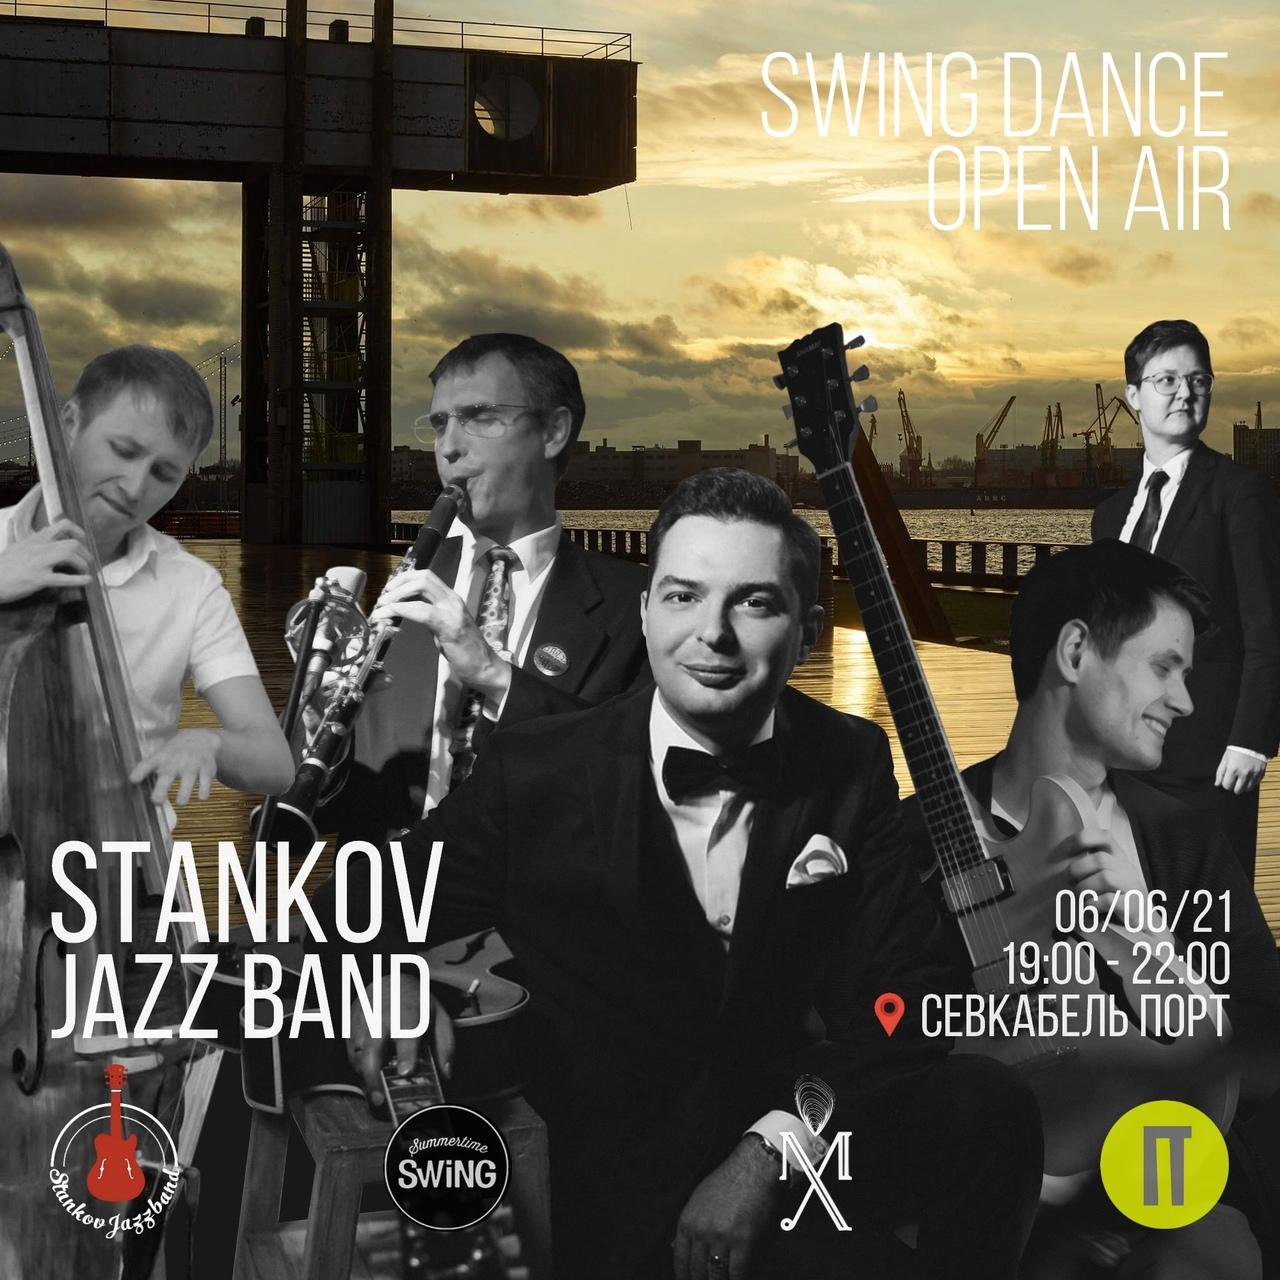 06.06 Stankov Jazz Band в Севкабель Порт!